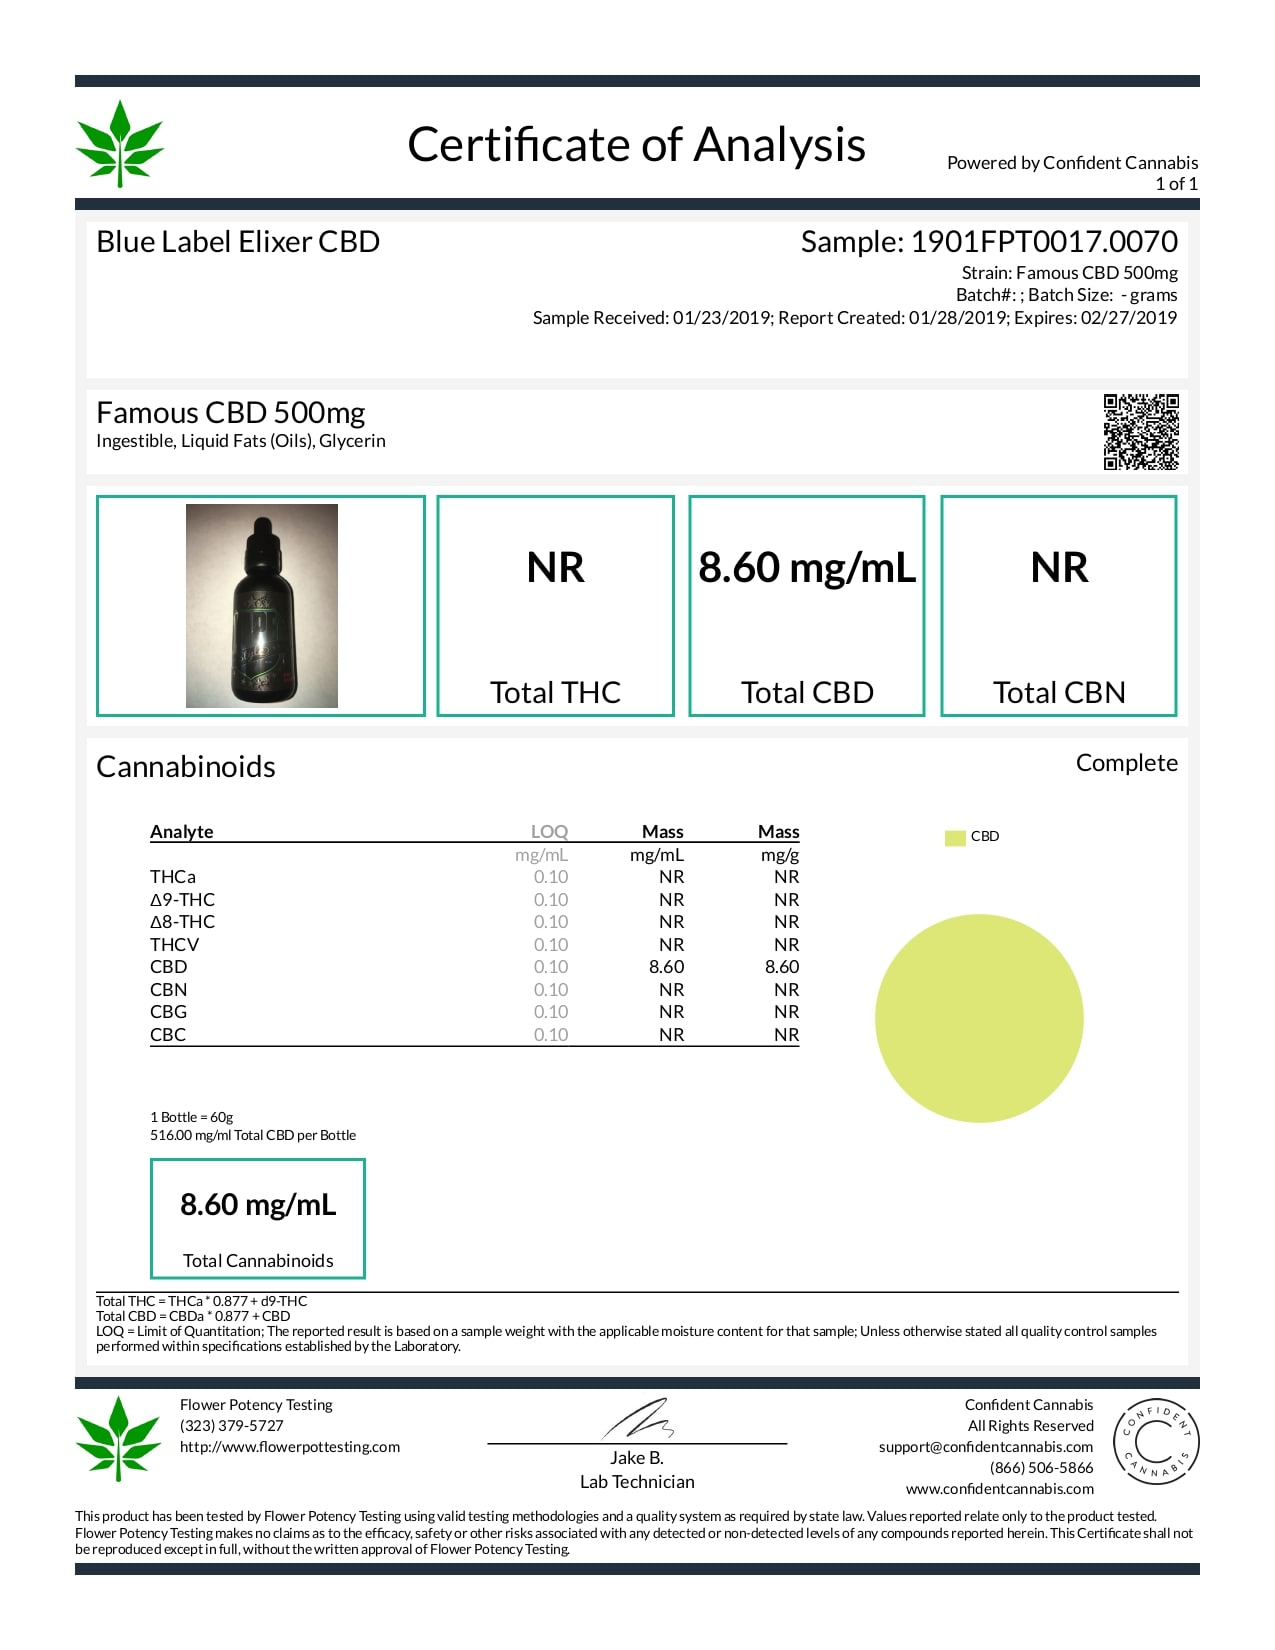 Blue Label CBD Vape Juice Famous! 500mg Lab Report